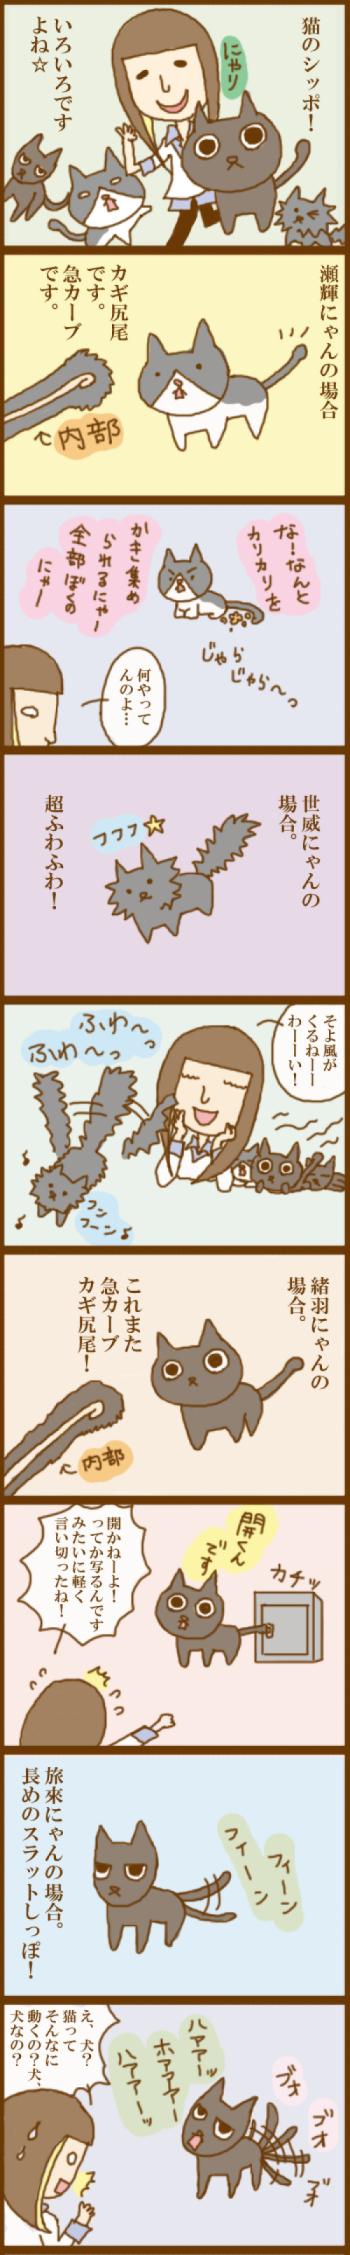 f:id:suzuokayu:20201114173933j:plain